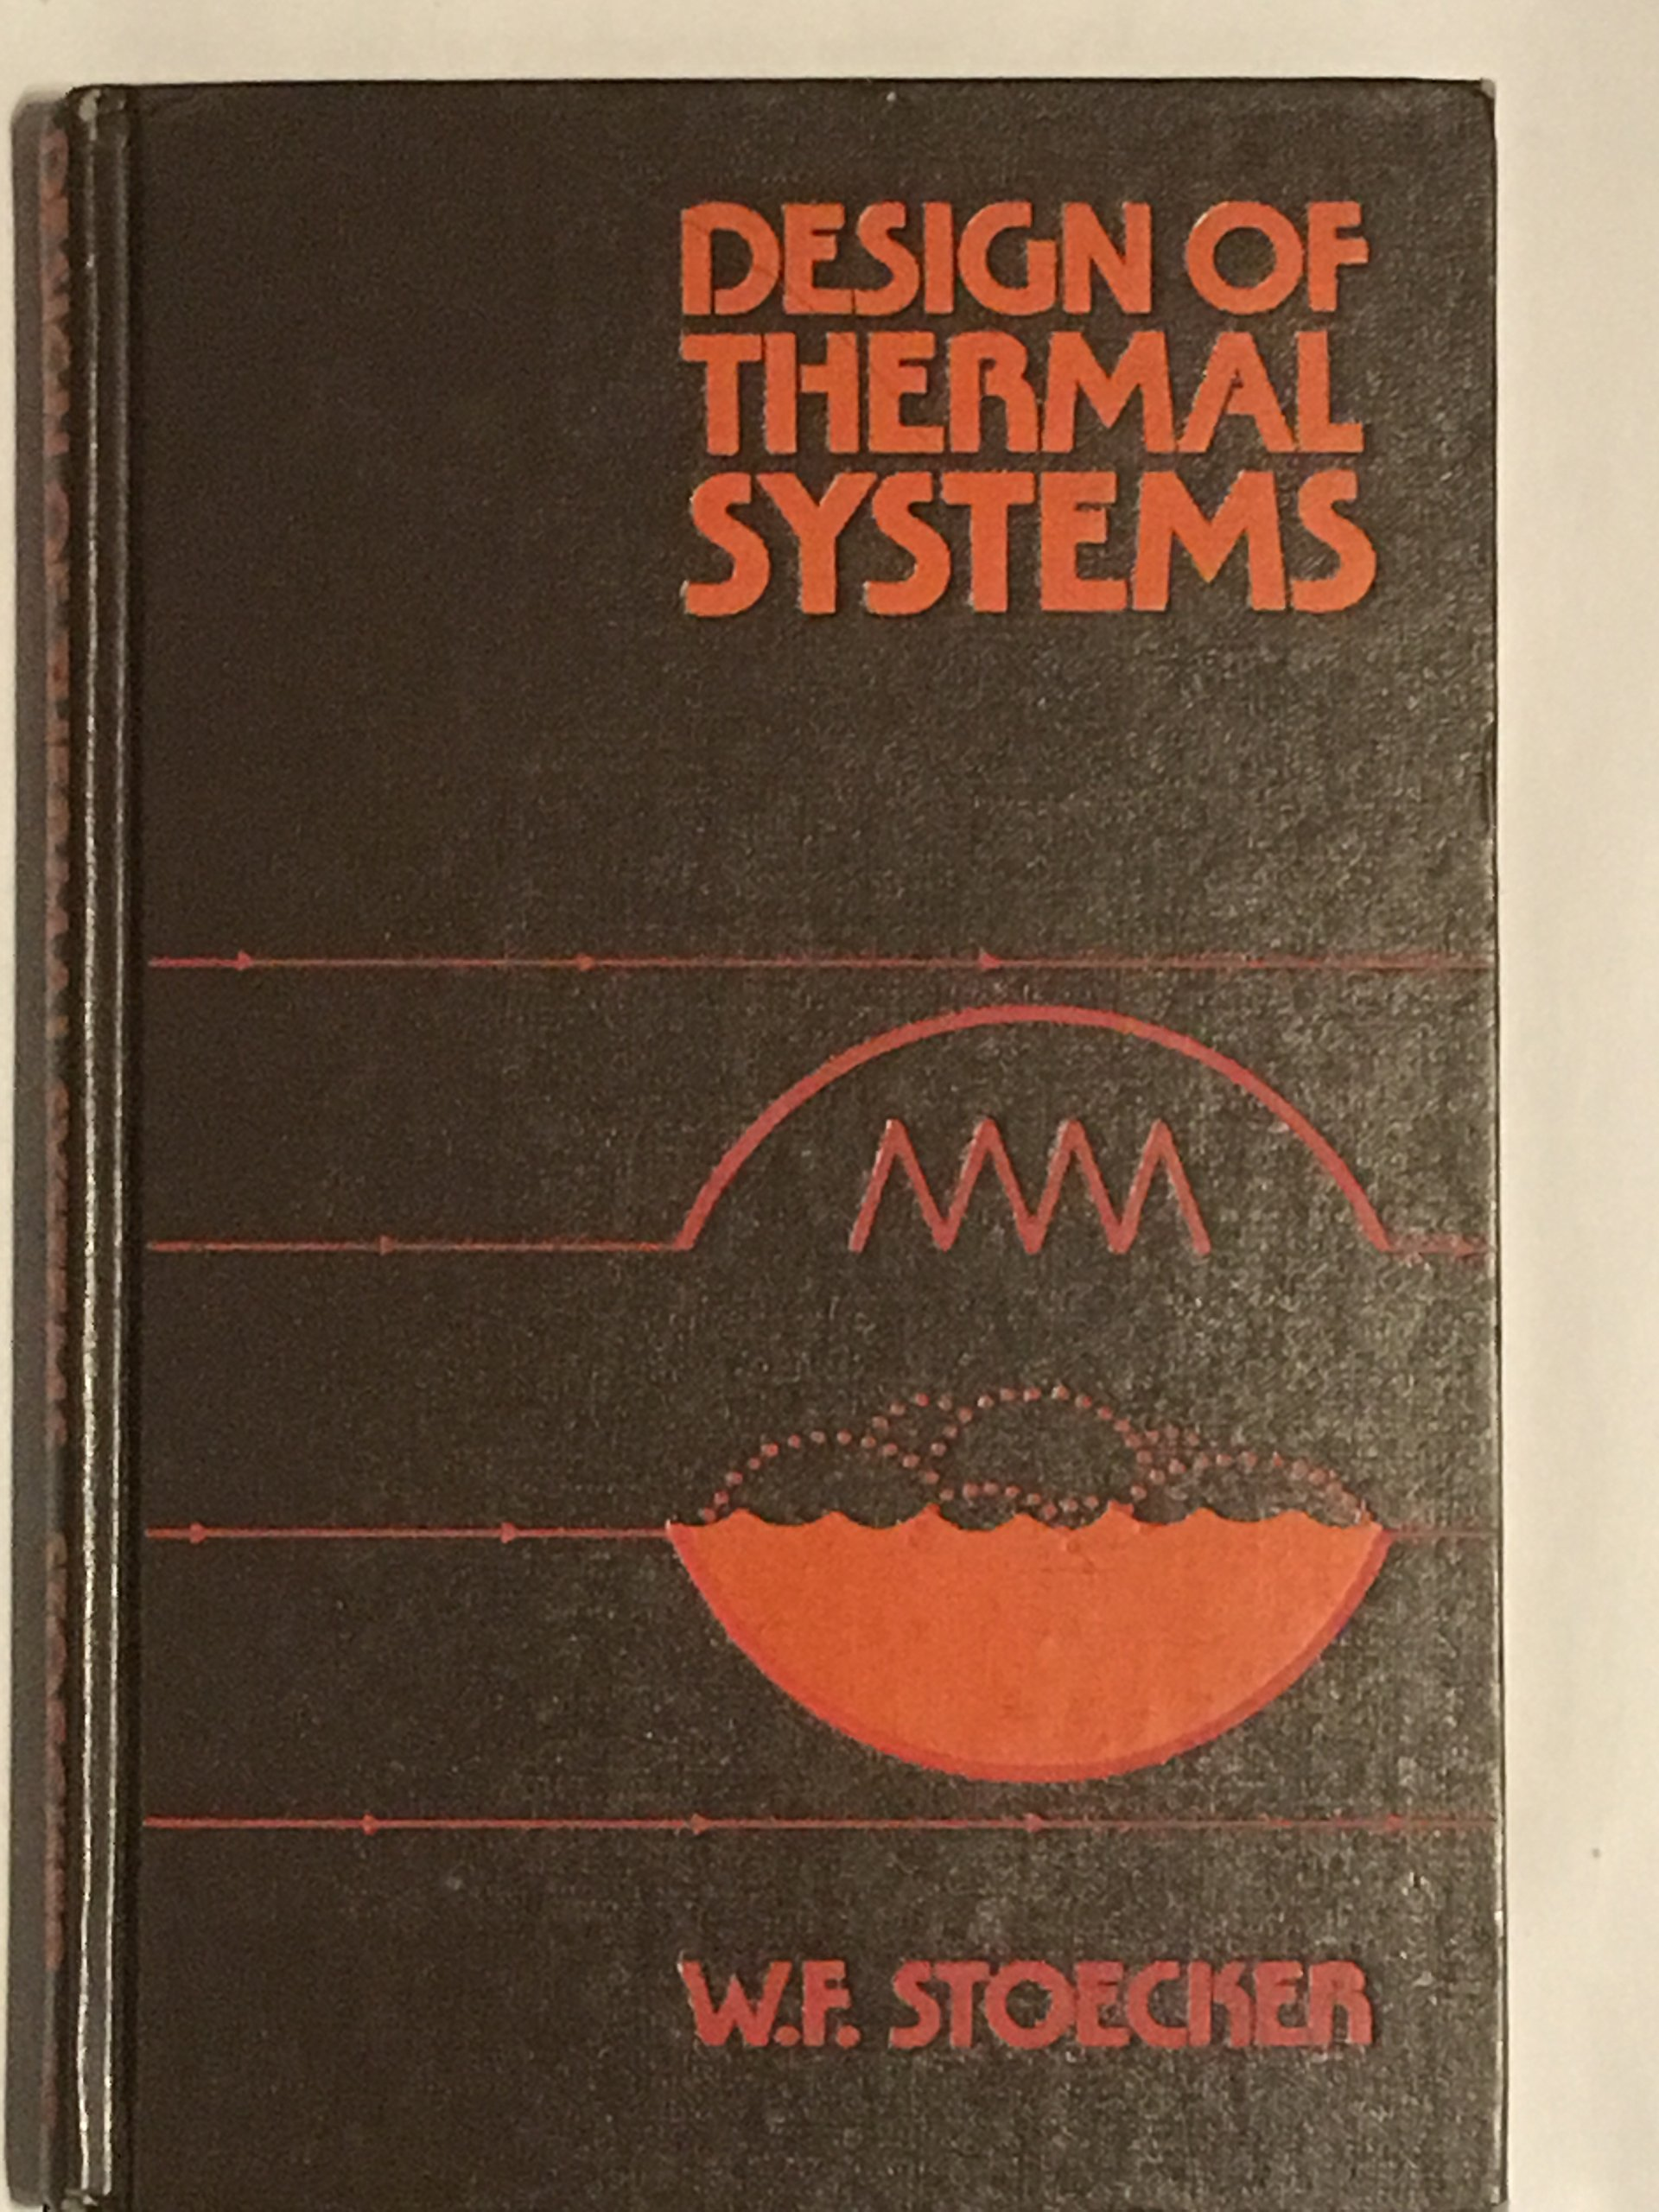 Design Of Thermal Systems Stoecker W F 9780070616189 Amazon Com Books